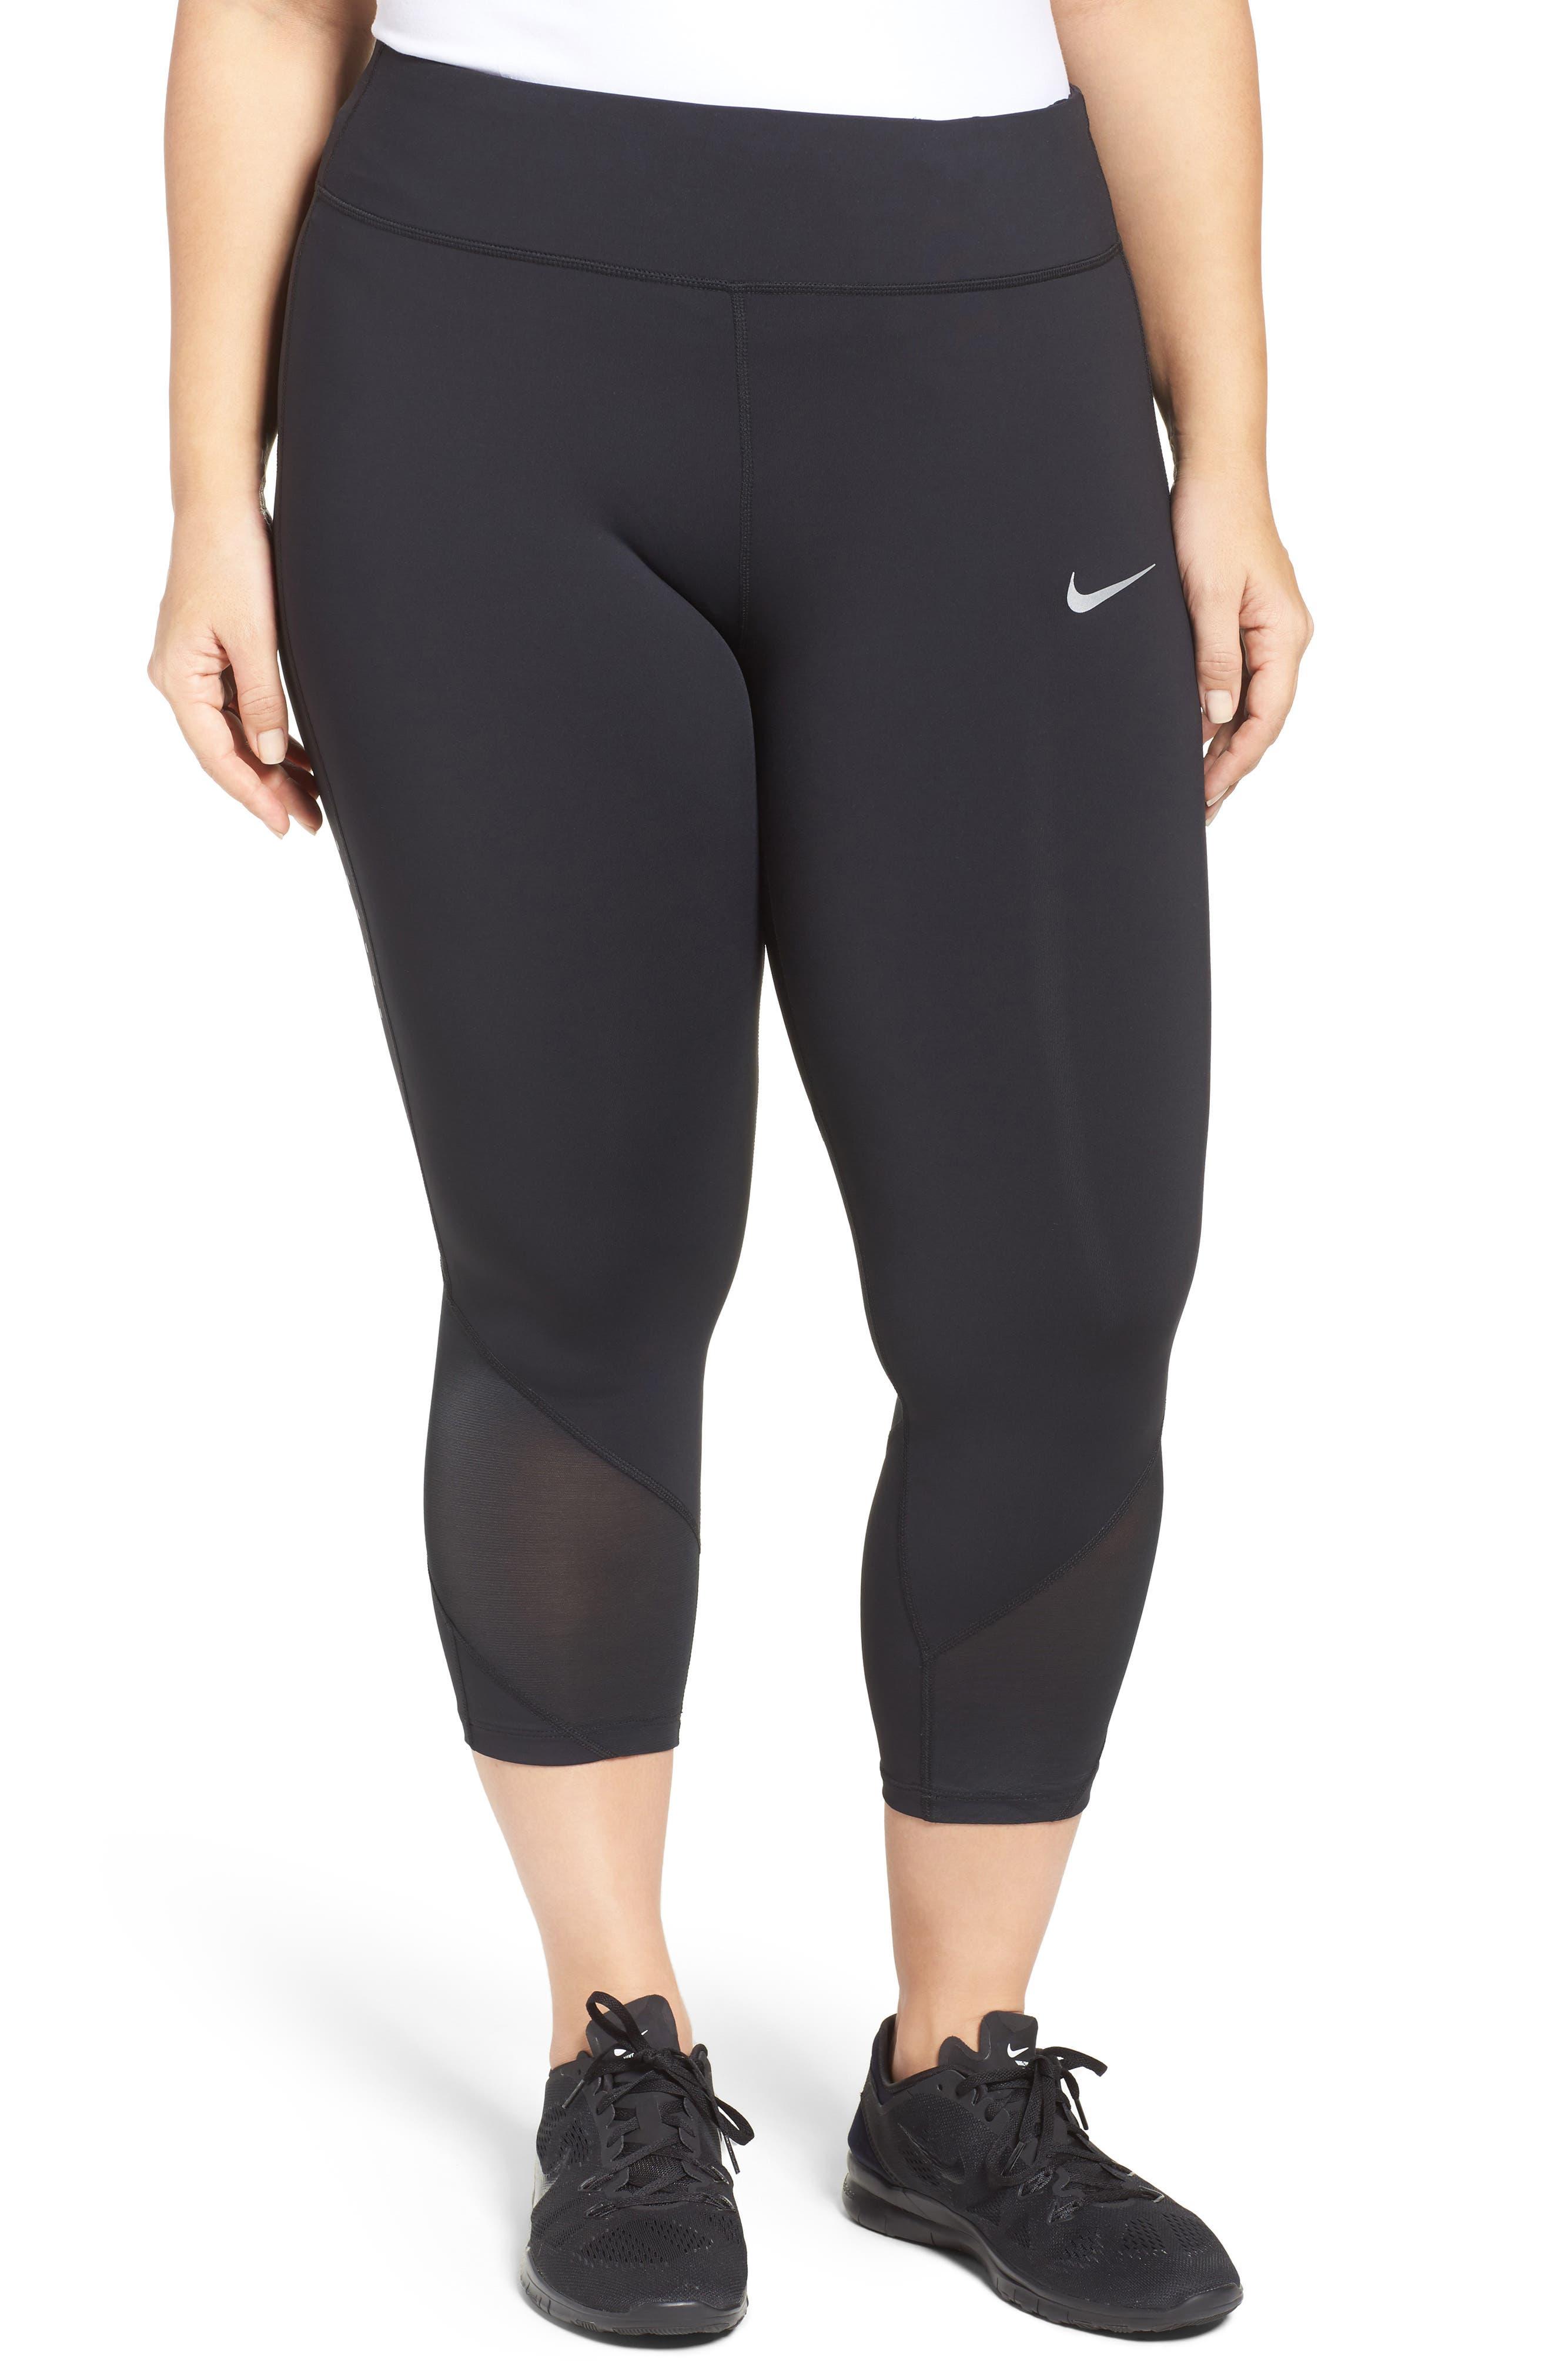 Nike Power Epic Crop Run Tights (Plus Size)